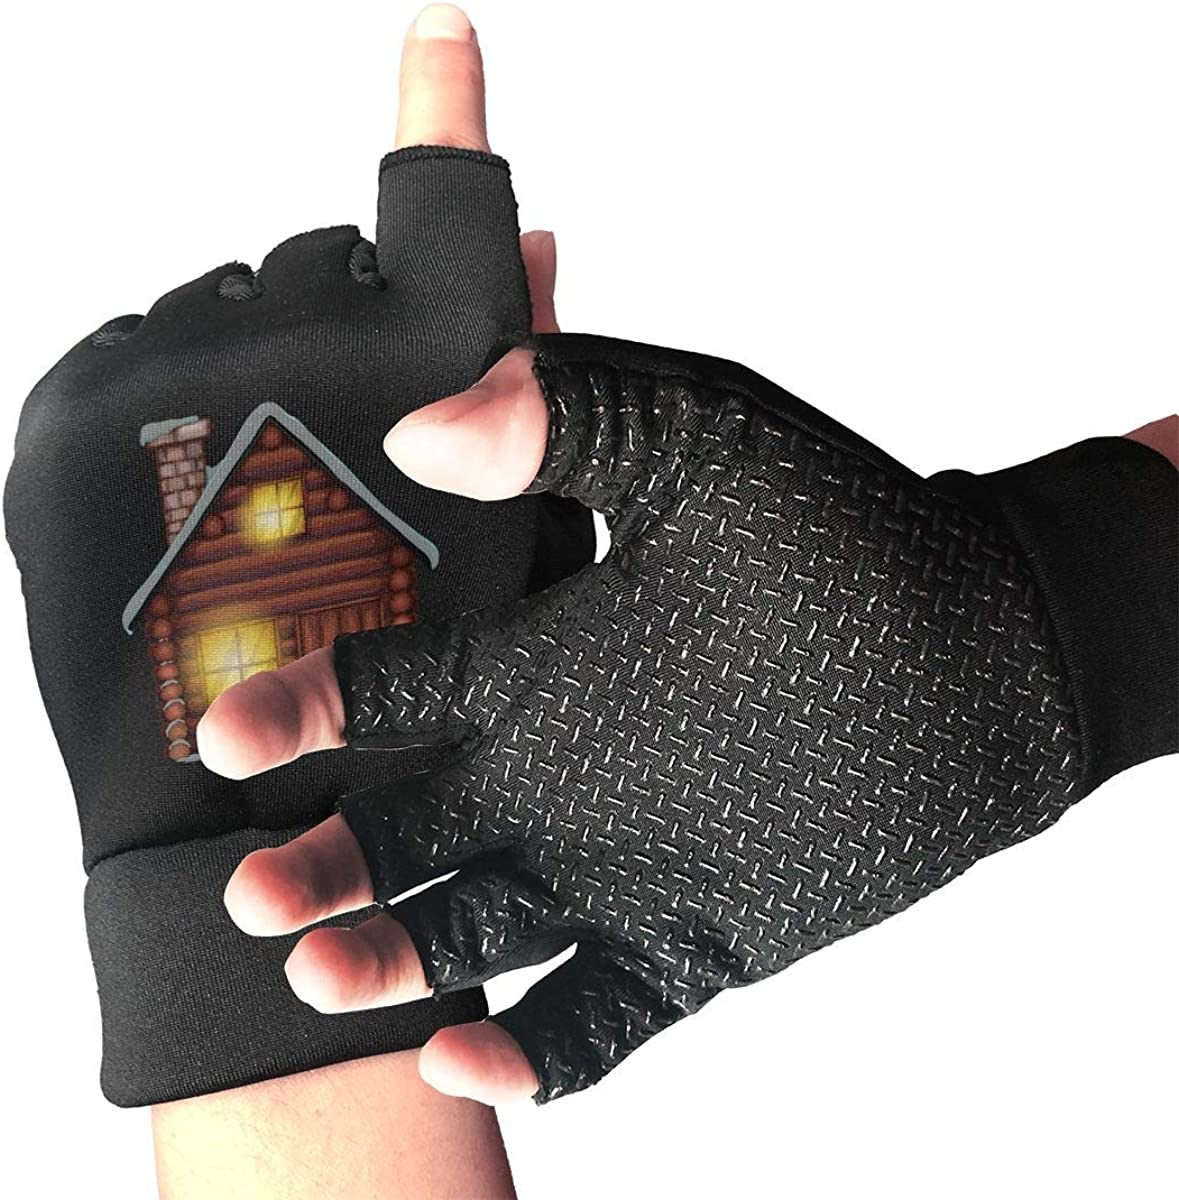 Gloves Merry Christmas House Fingerless Gloves Short Touchscreen Gloves Winter Motorcycle Biker Mitten